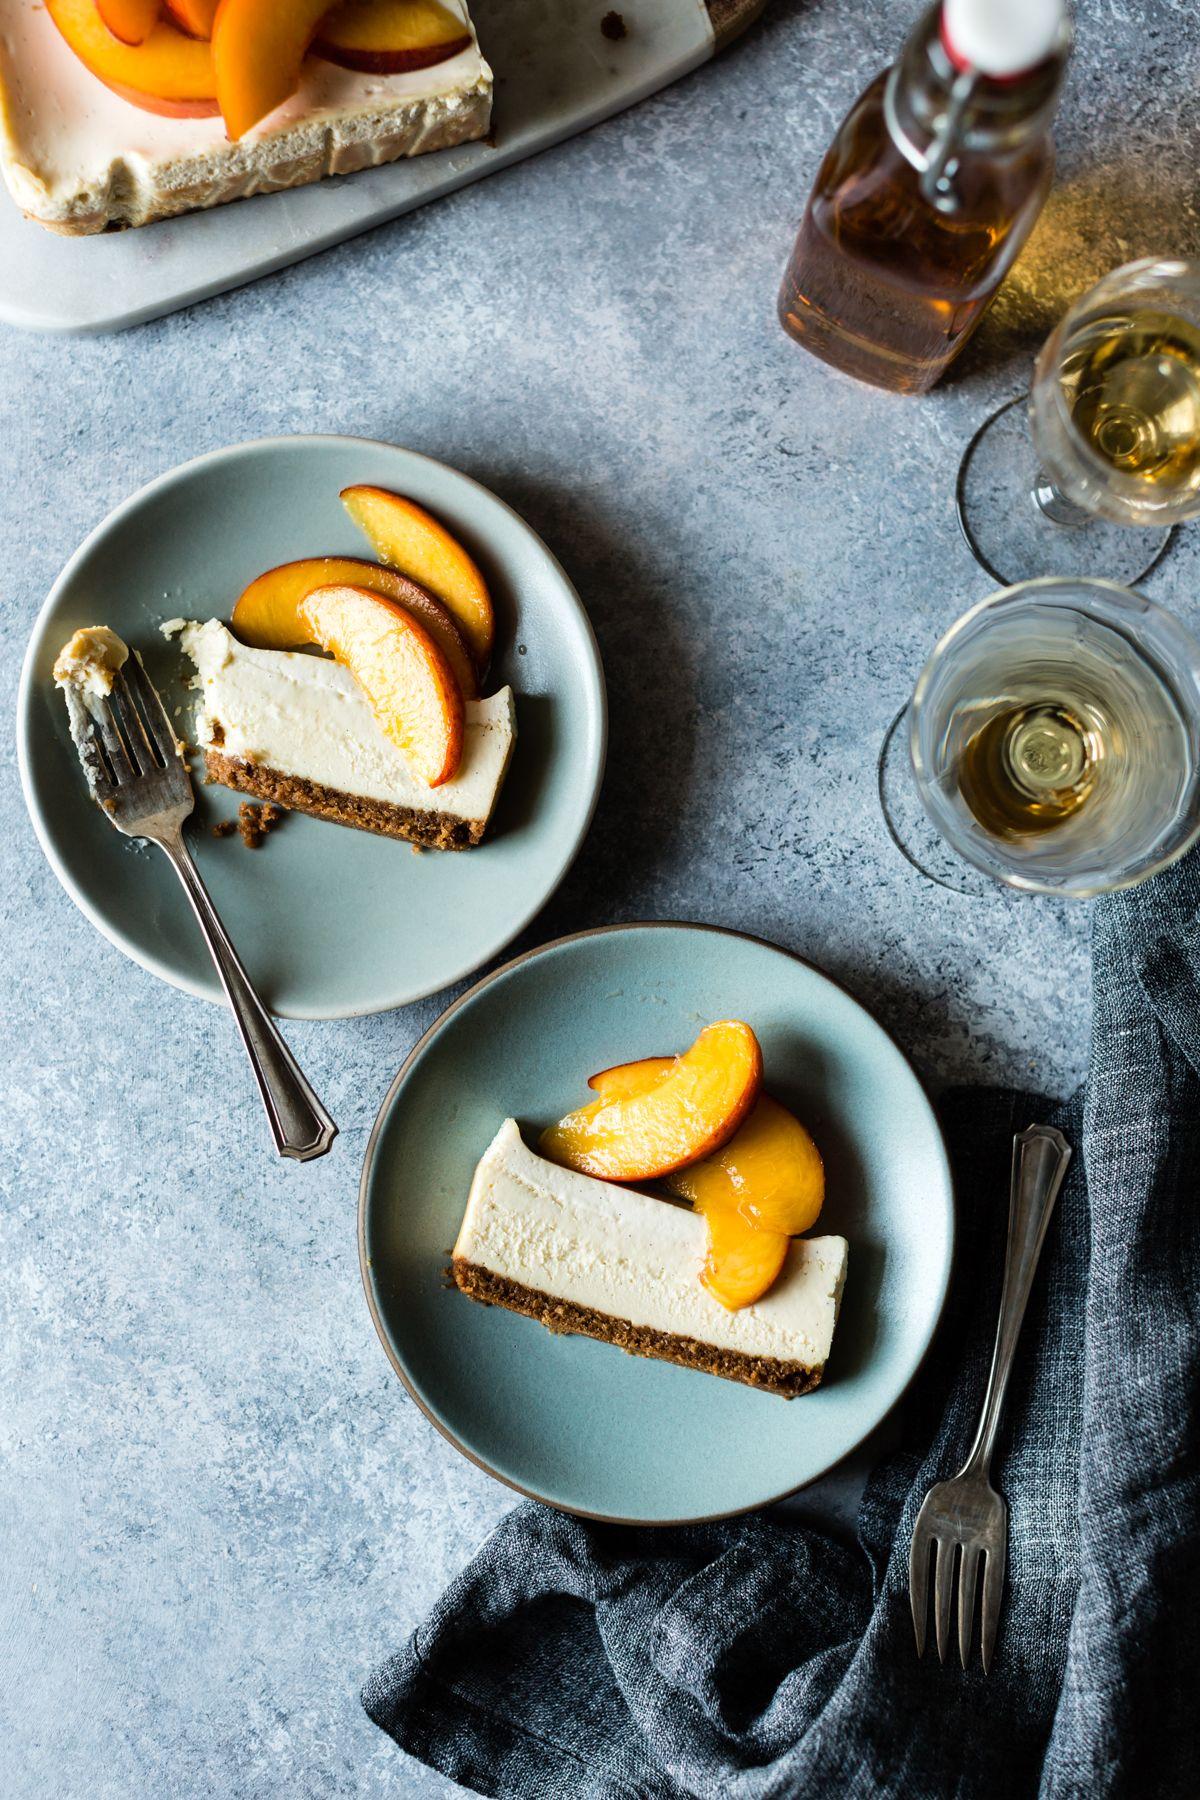 This Gluten Free Small Batch Cheesecake With Elderflower Peaches